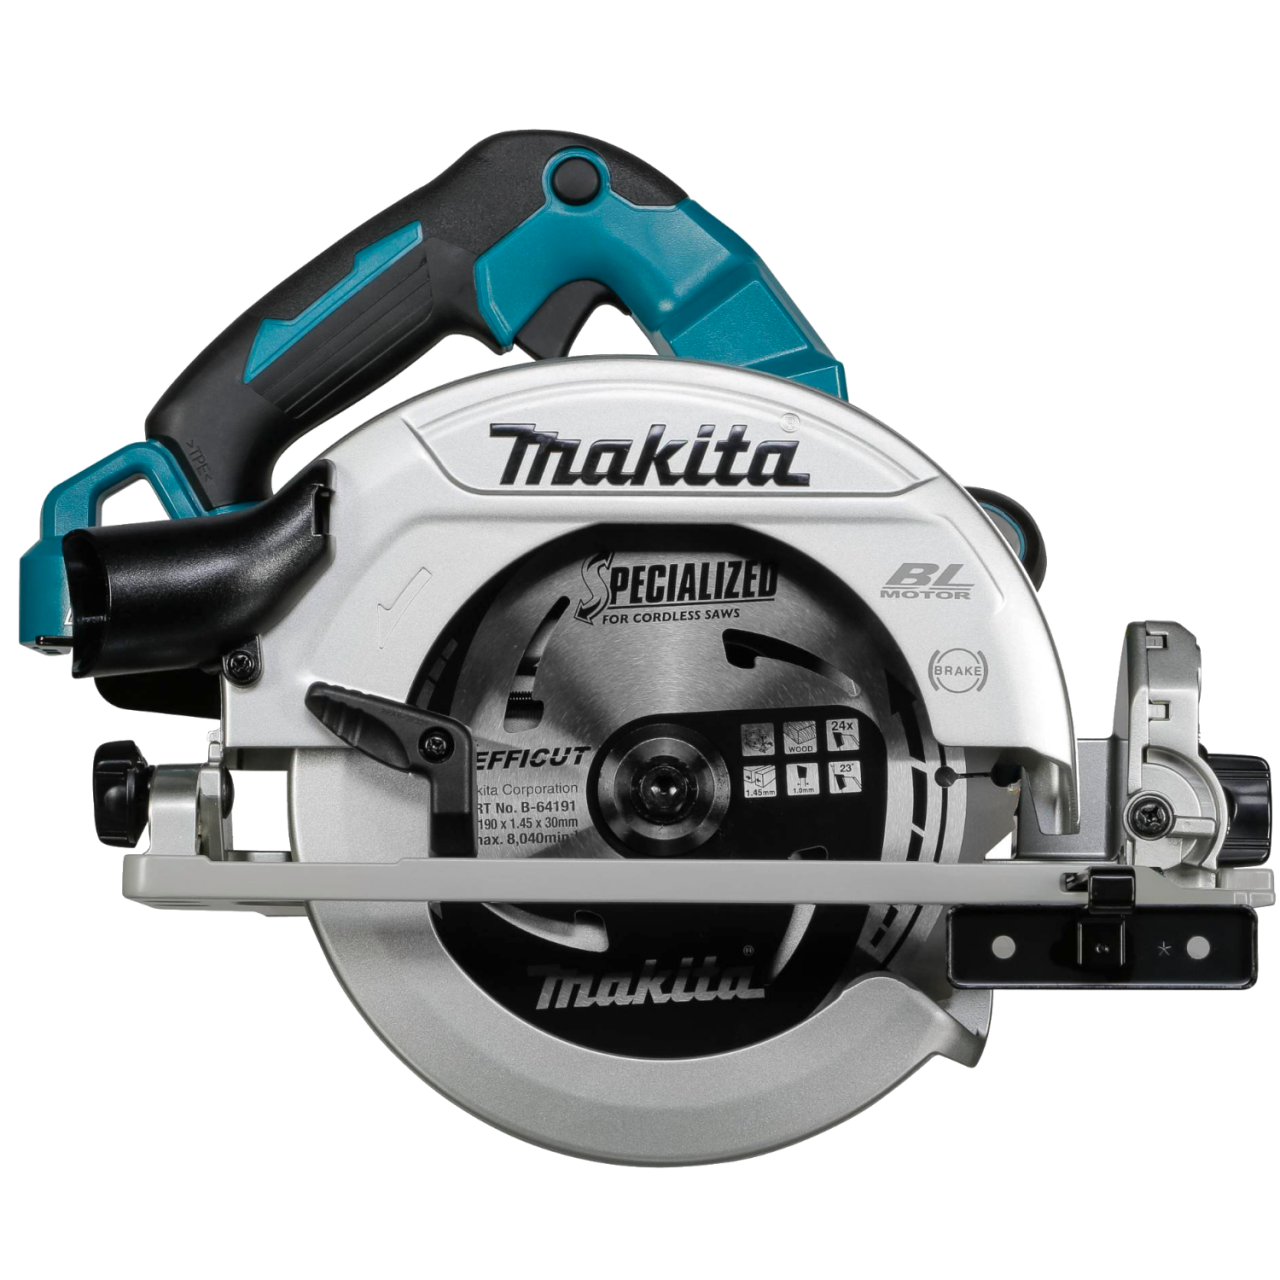 Makita DHS782ZJ Akku-Handkreissäge im MAKPAC Gr. 4 inkl. Einlage, 2x18V, 62,5 mm, 6.000 min-1